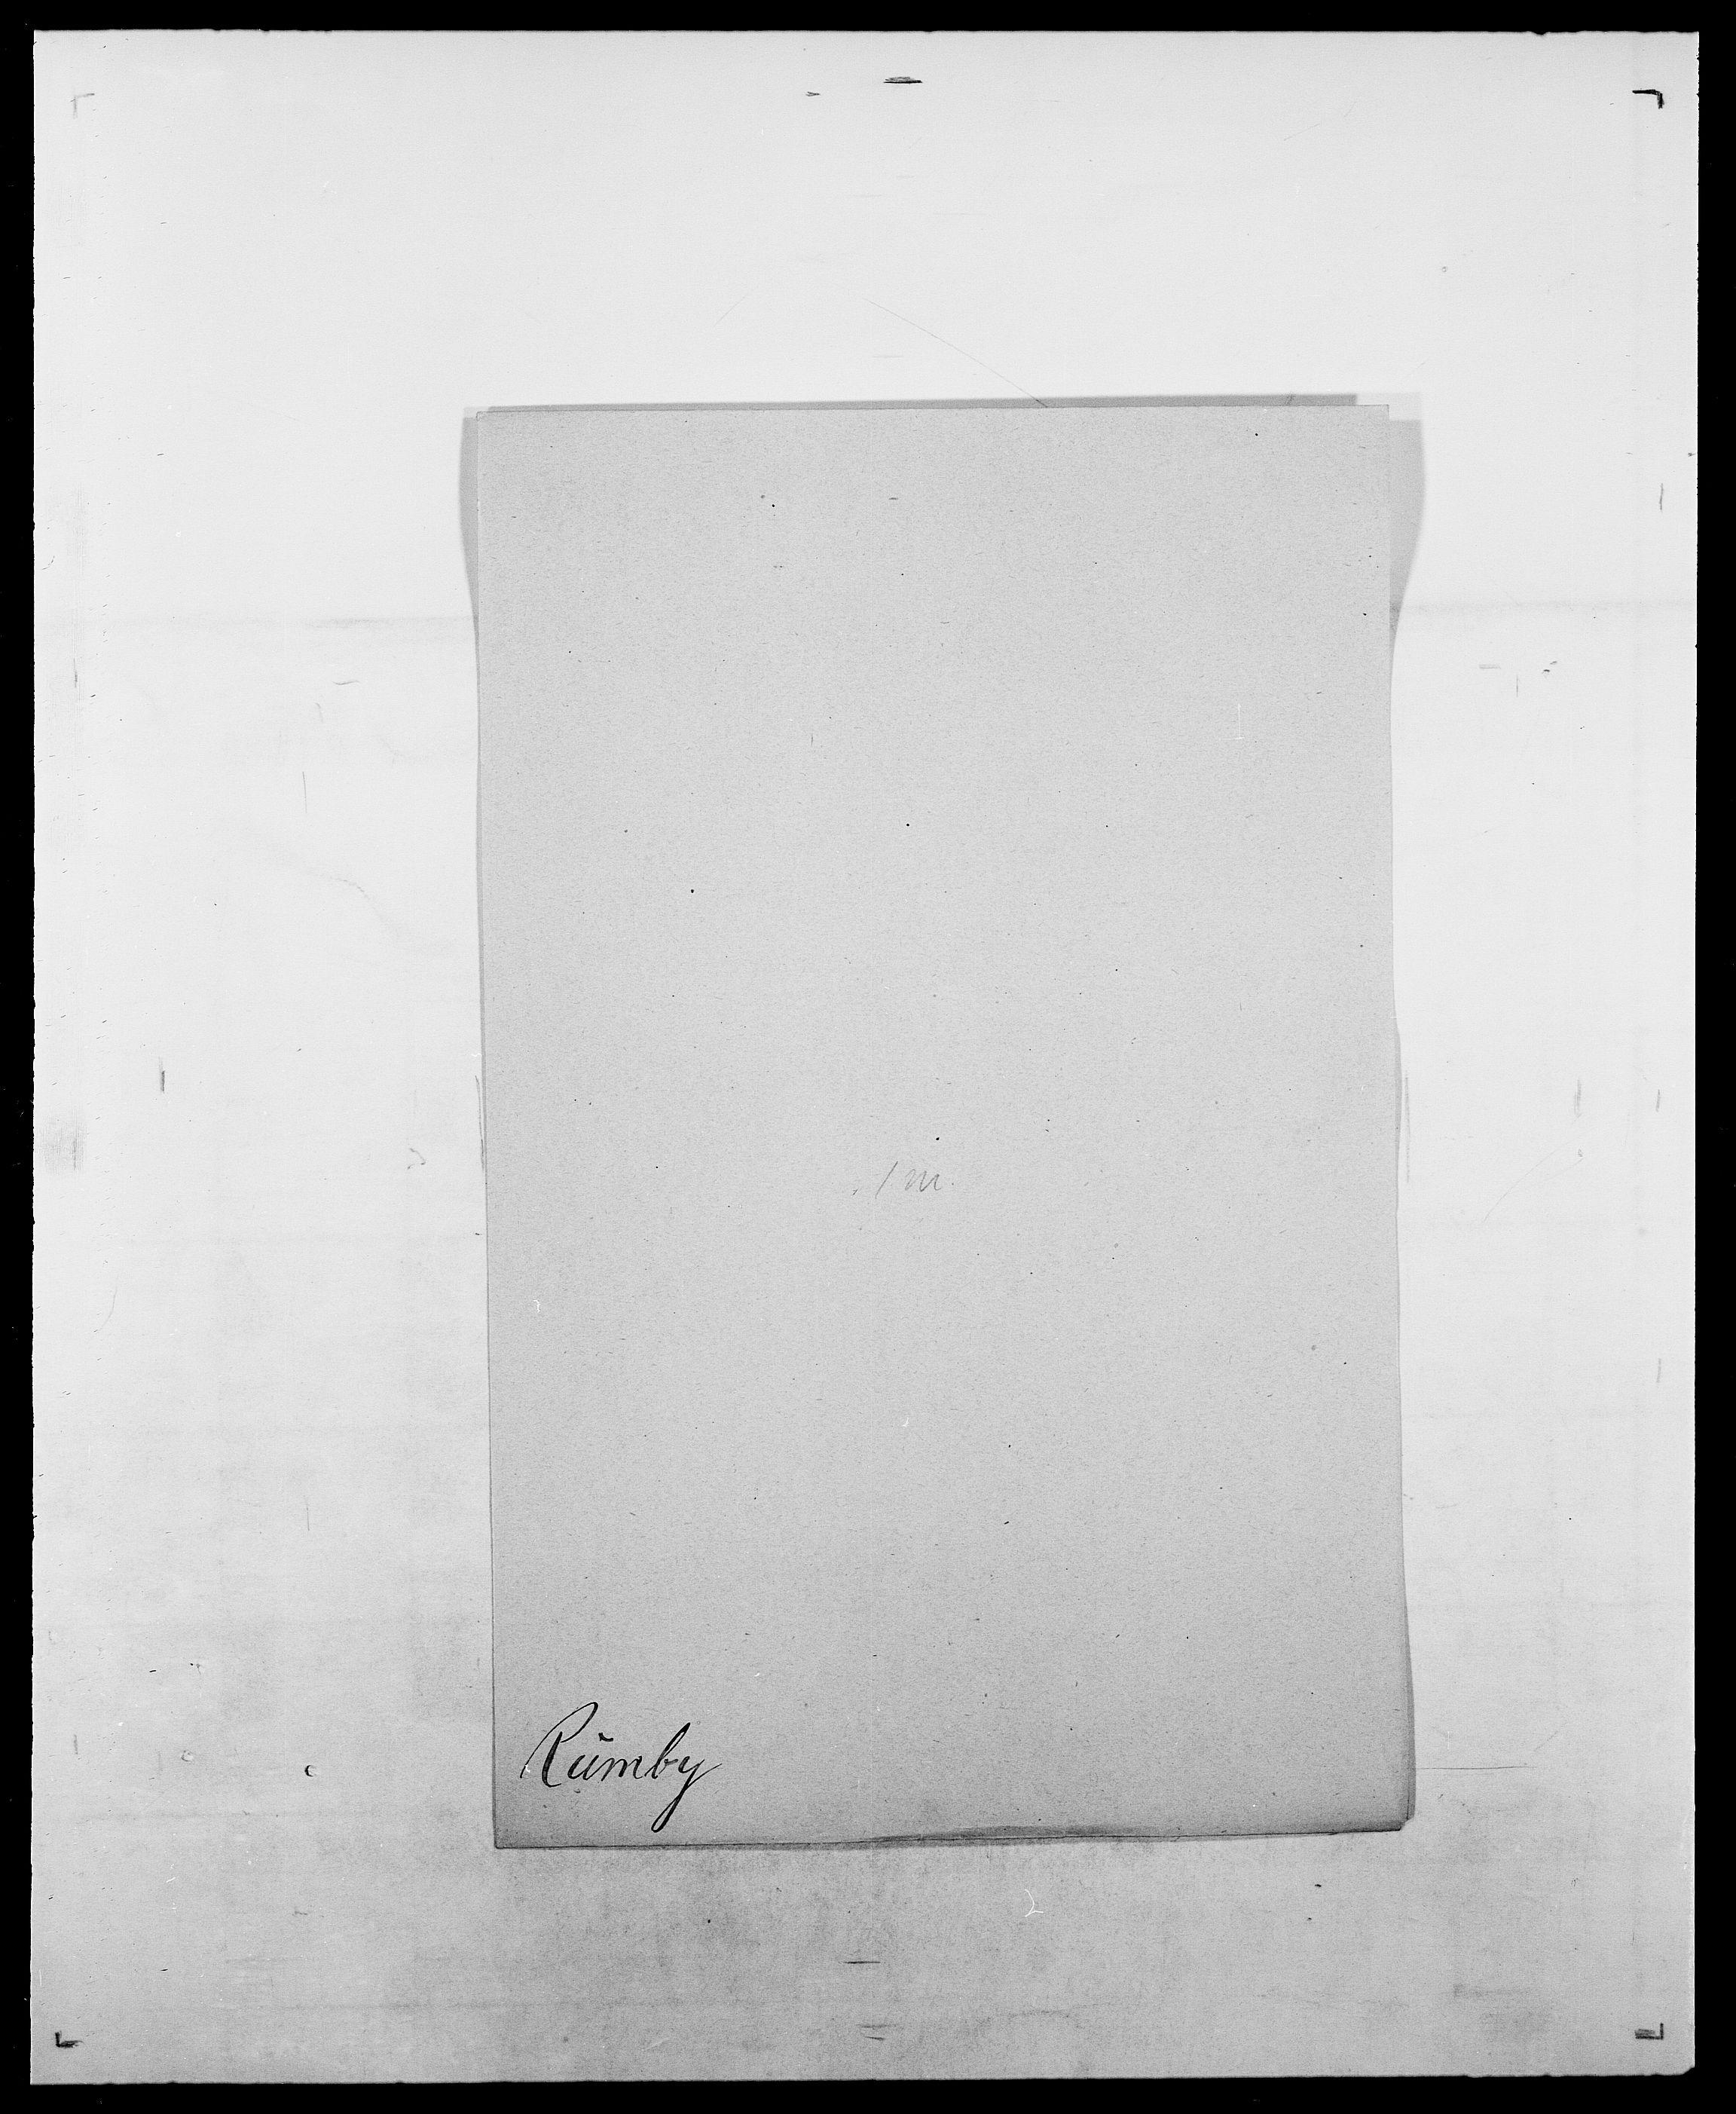 SAO, Delgobe, Charles Antoine - samling, D/Da/L0033: Roald - Røyem, s. 455